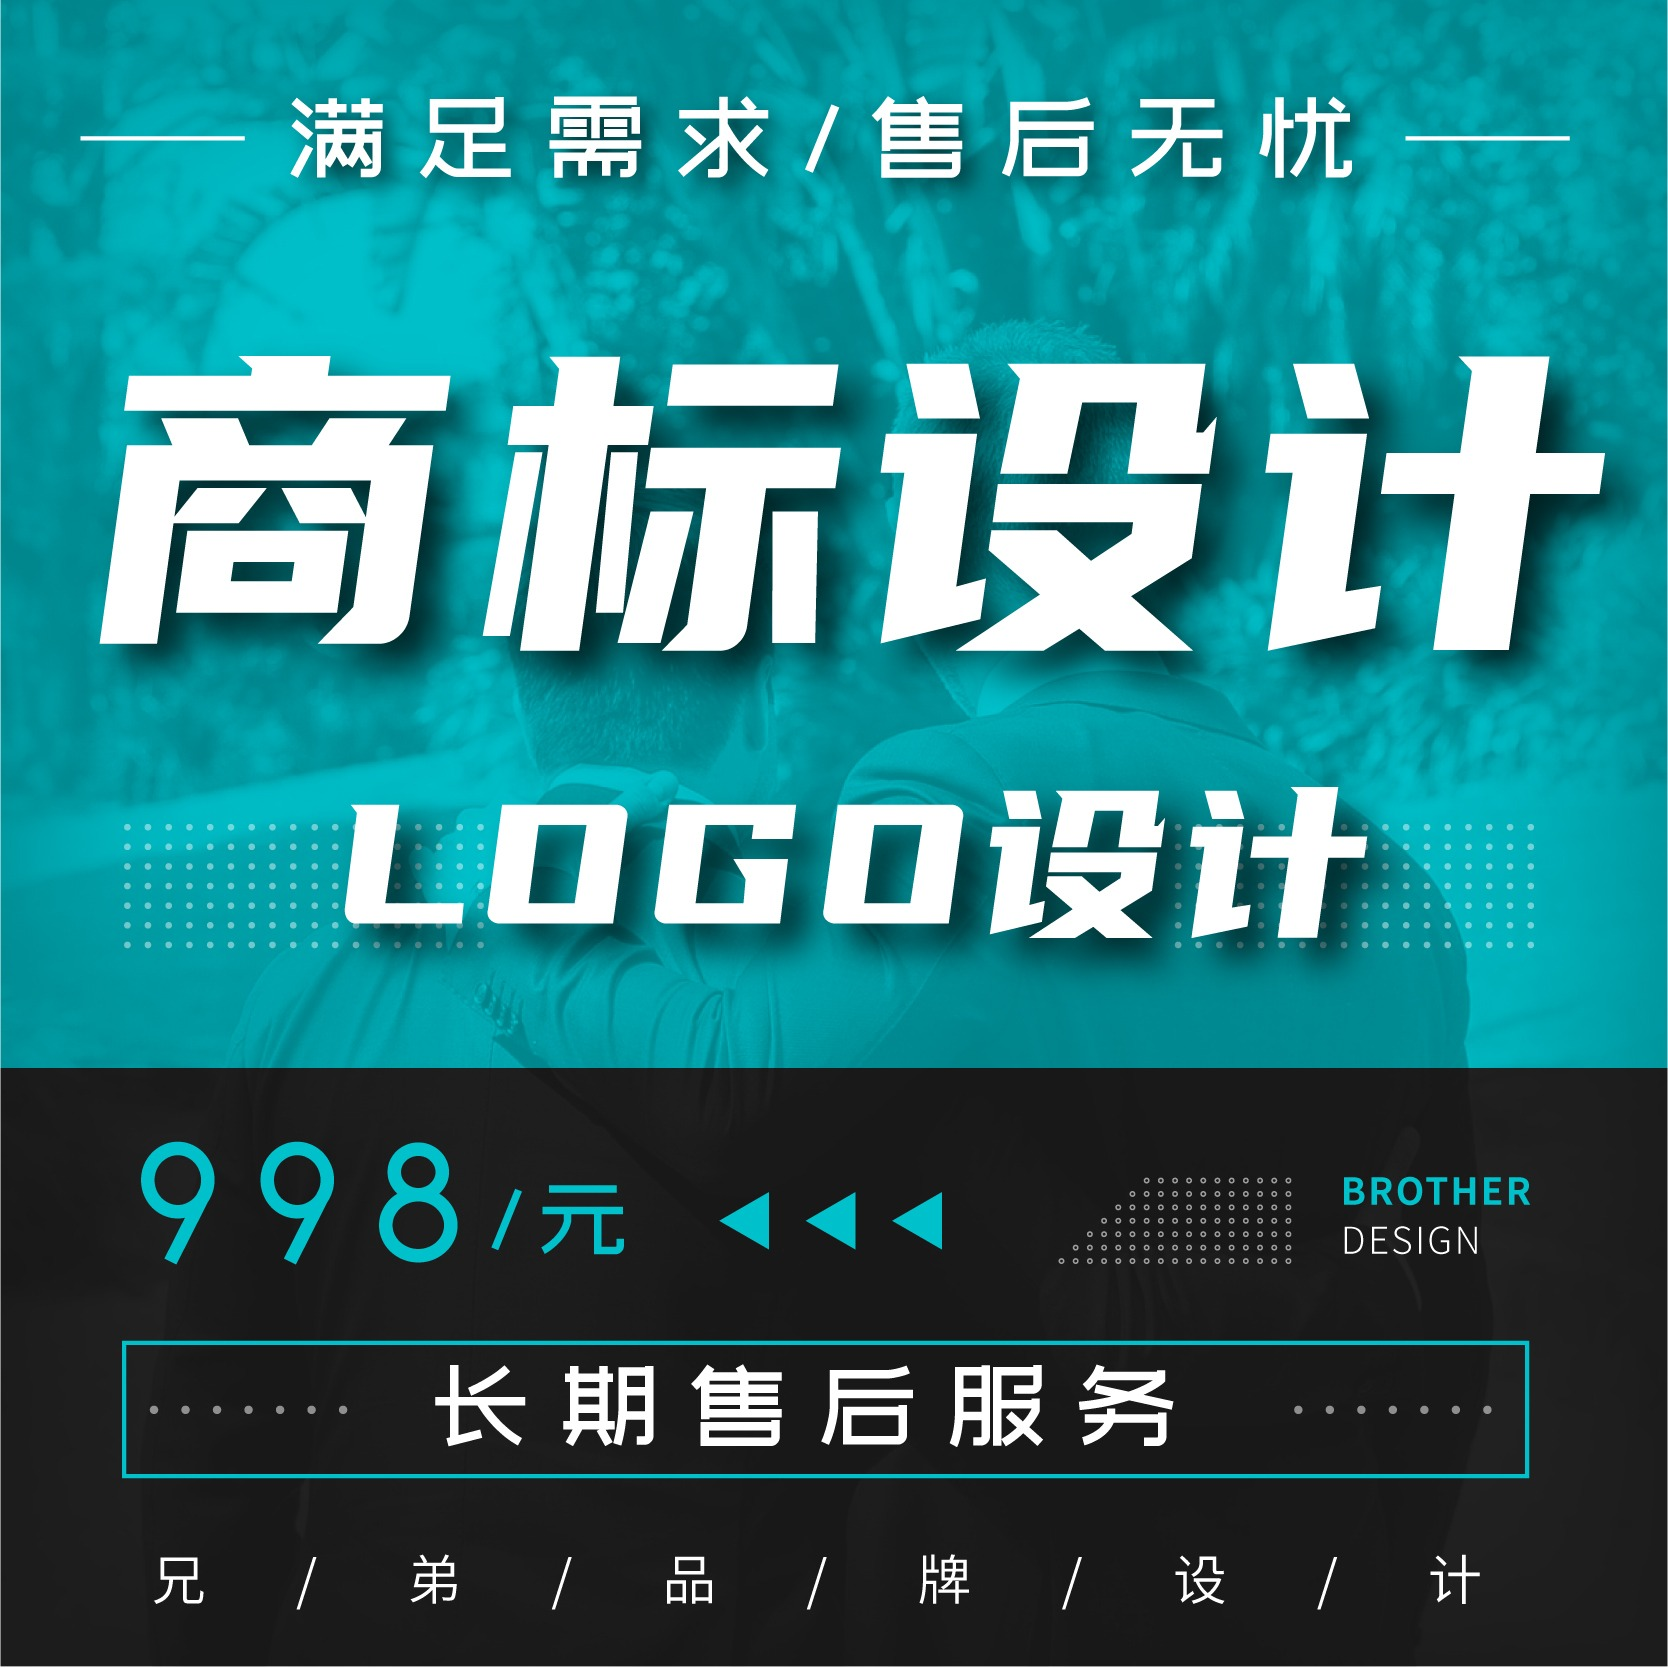 logo设计餐饮公司LOGO设计产品企业门店标志品牌卡通食品